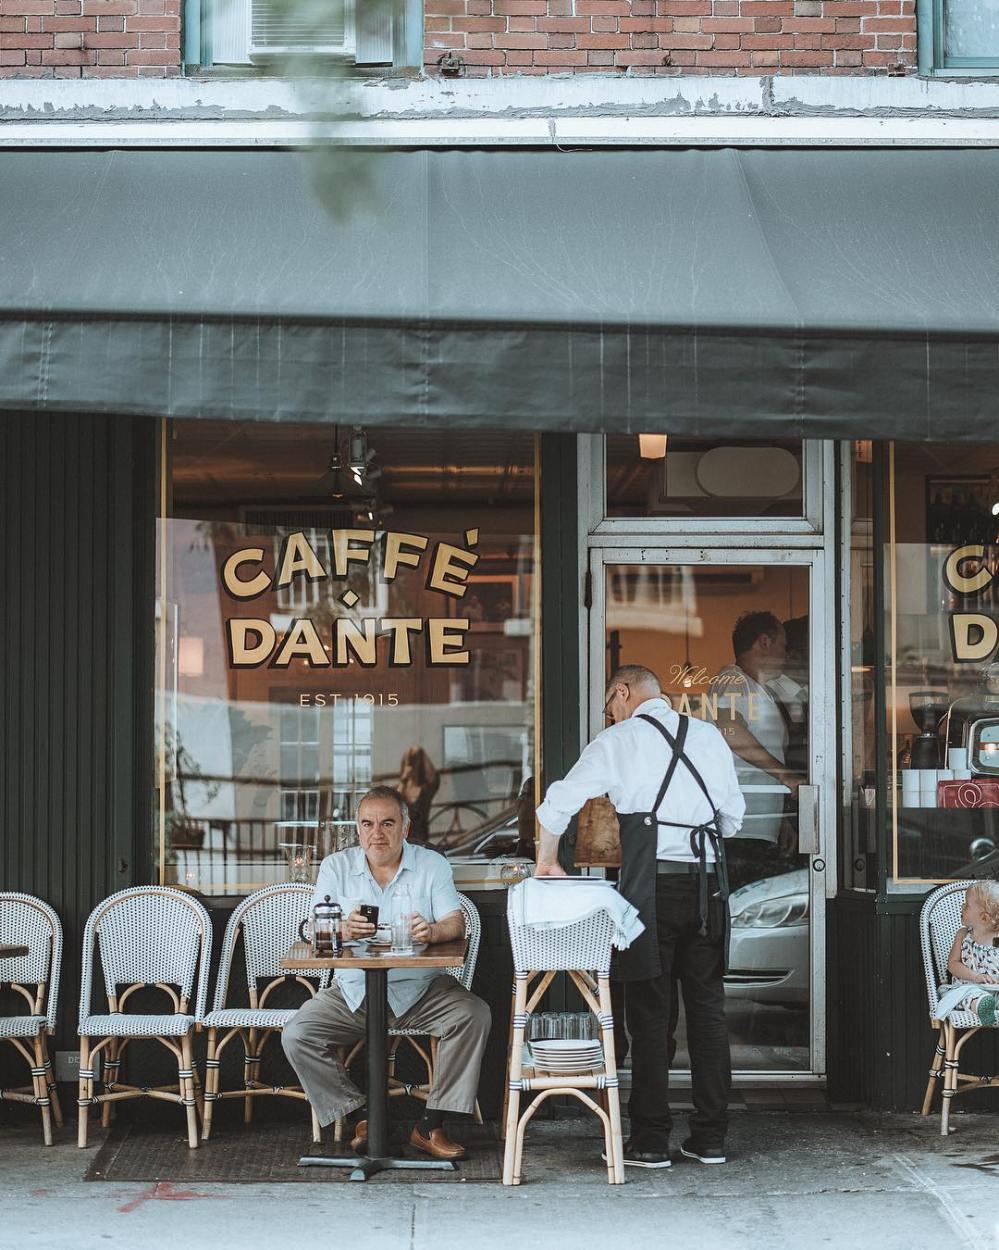 caffe dante new york.jpg